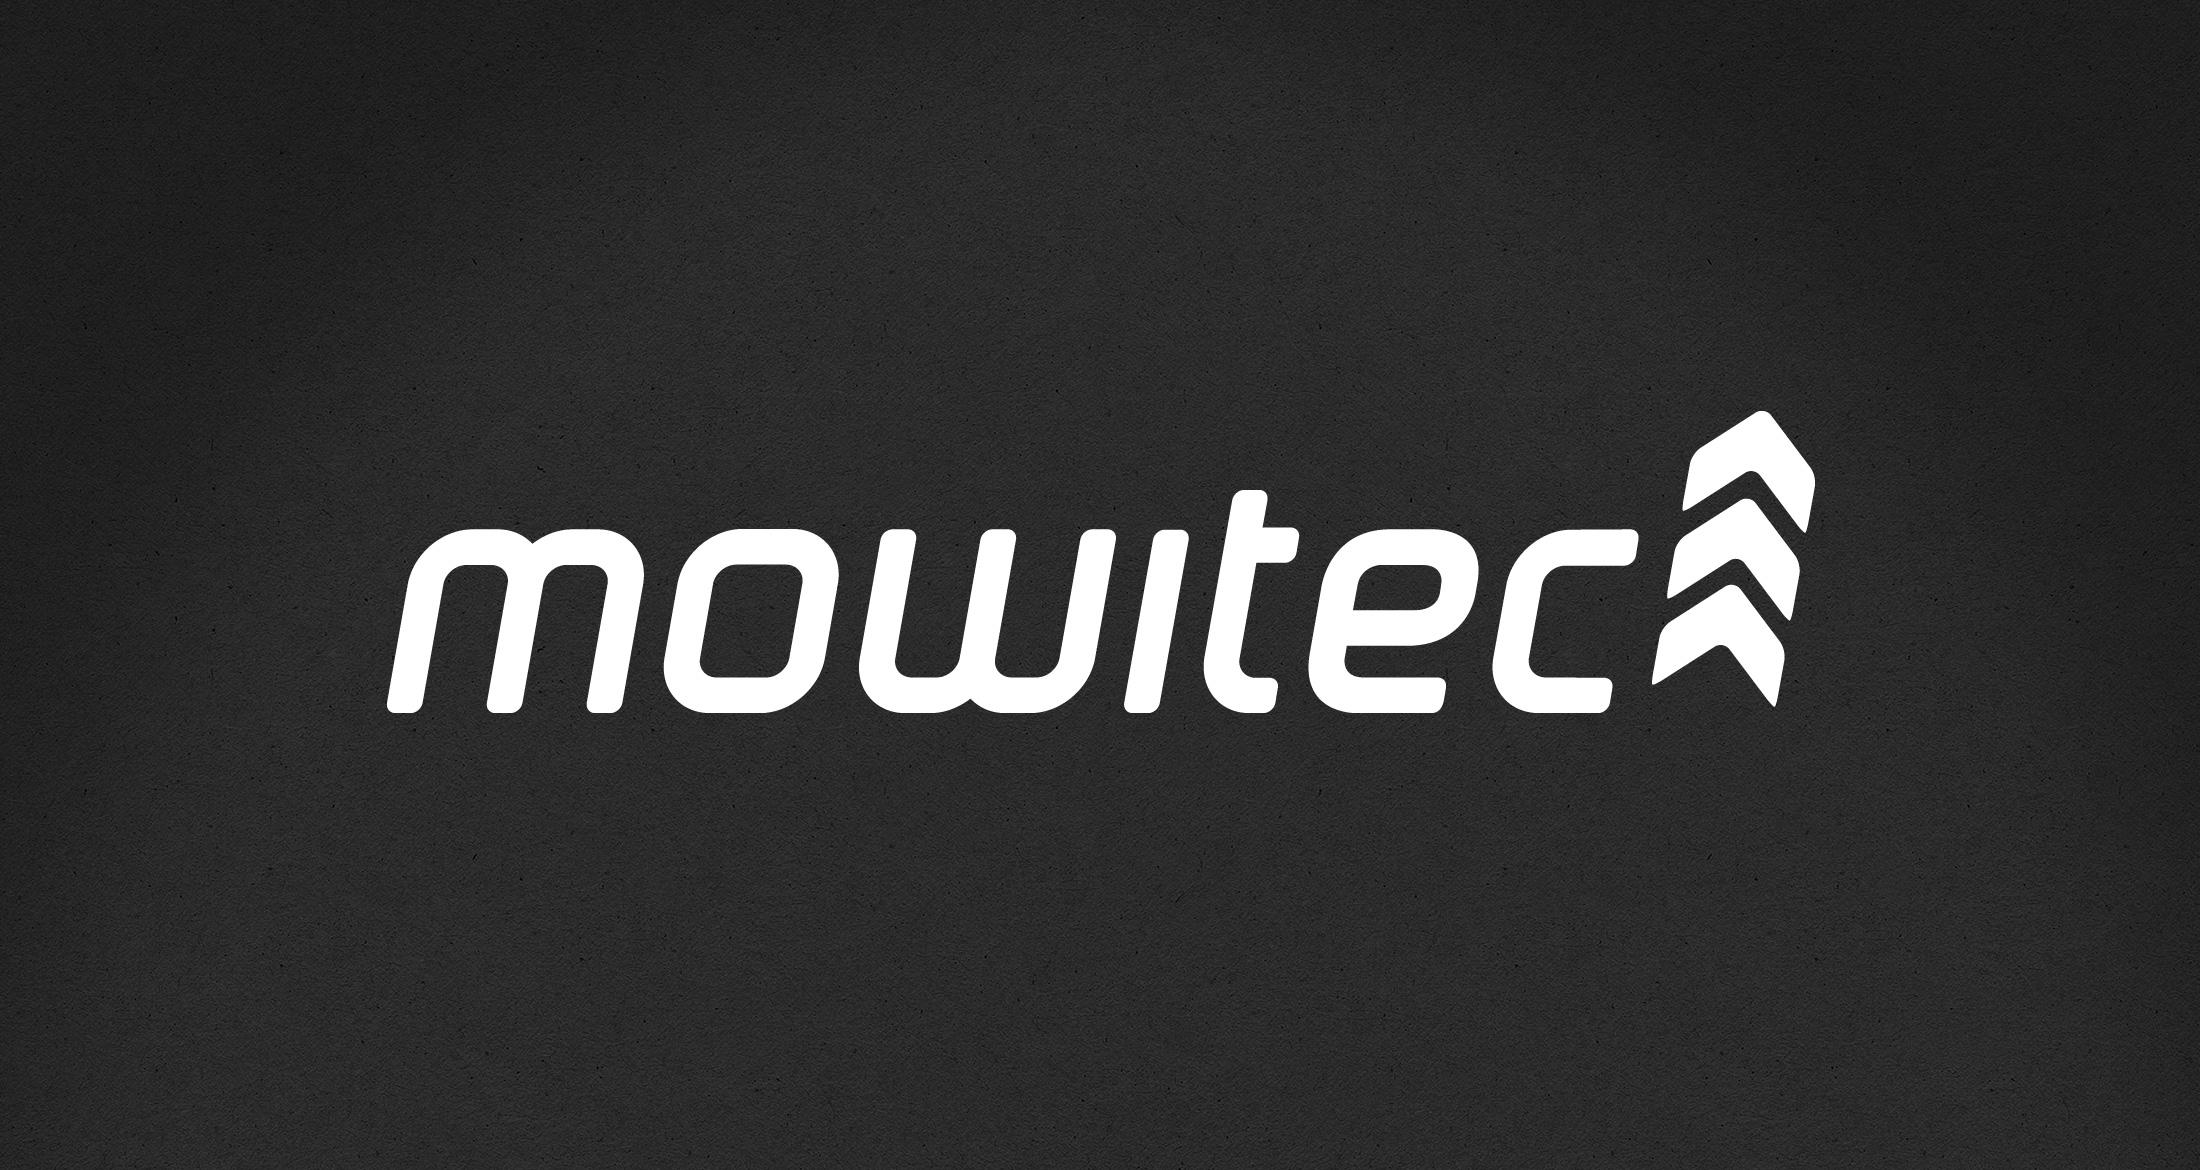 Logo mowitec, Mannheim, 1-farbig weiß (negativ)